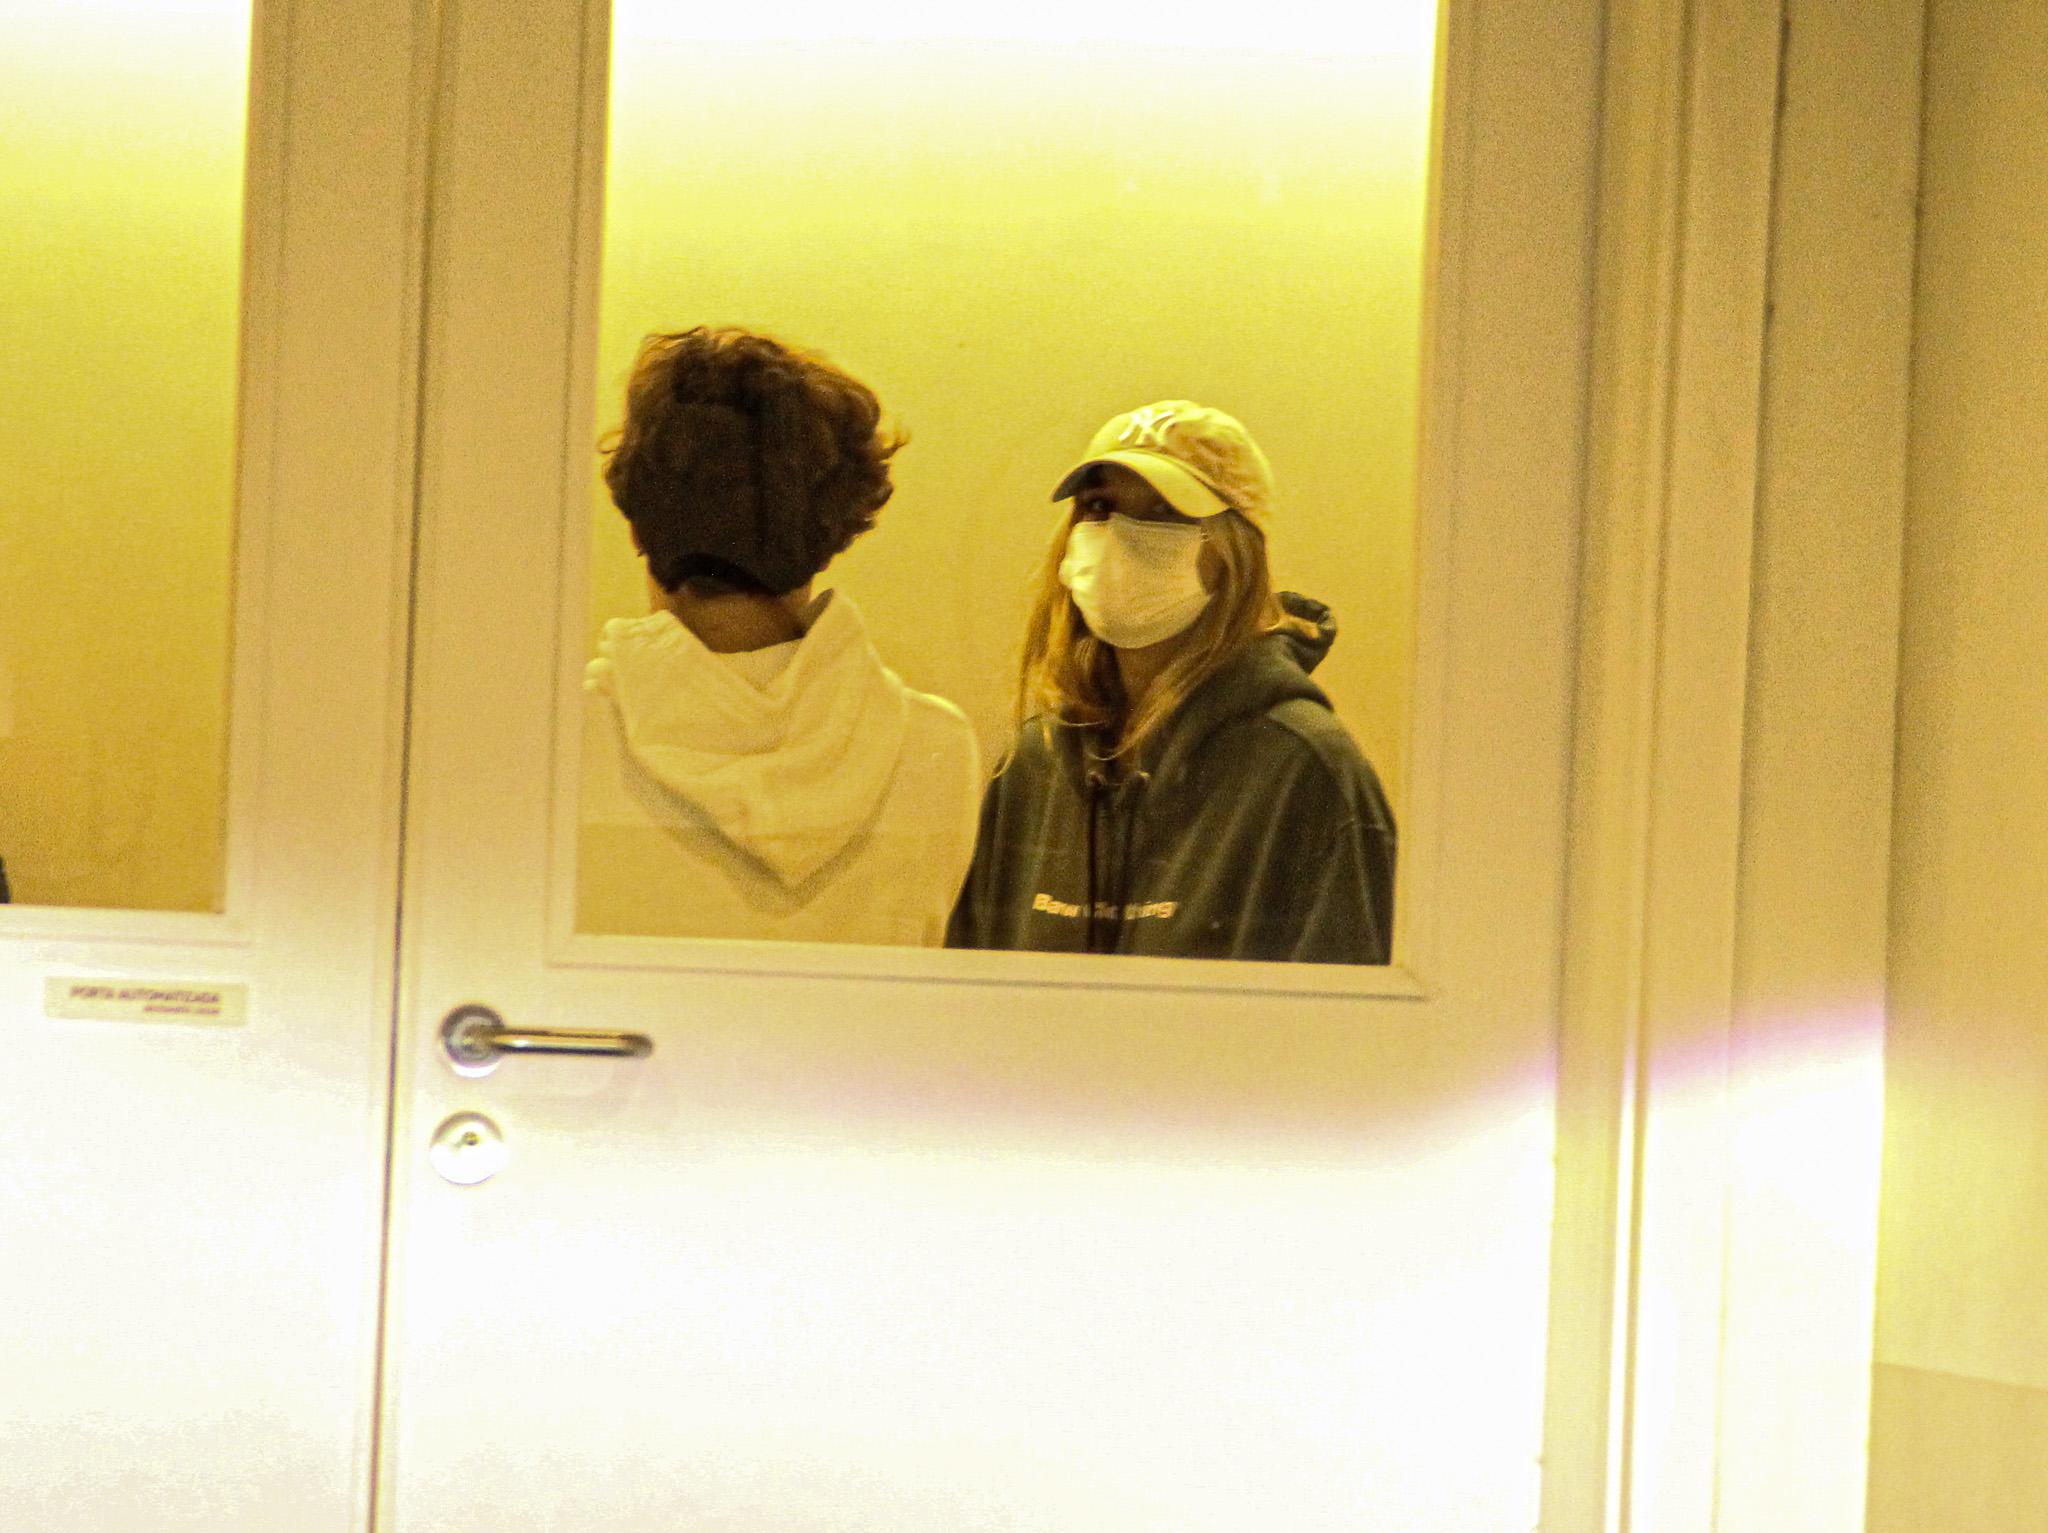 Sasha, acompanhada do marido, visita o pai, Luciano Szafir no hospital